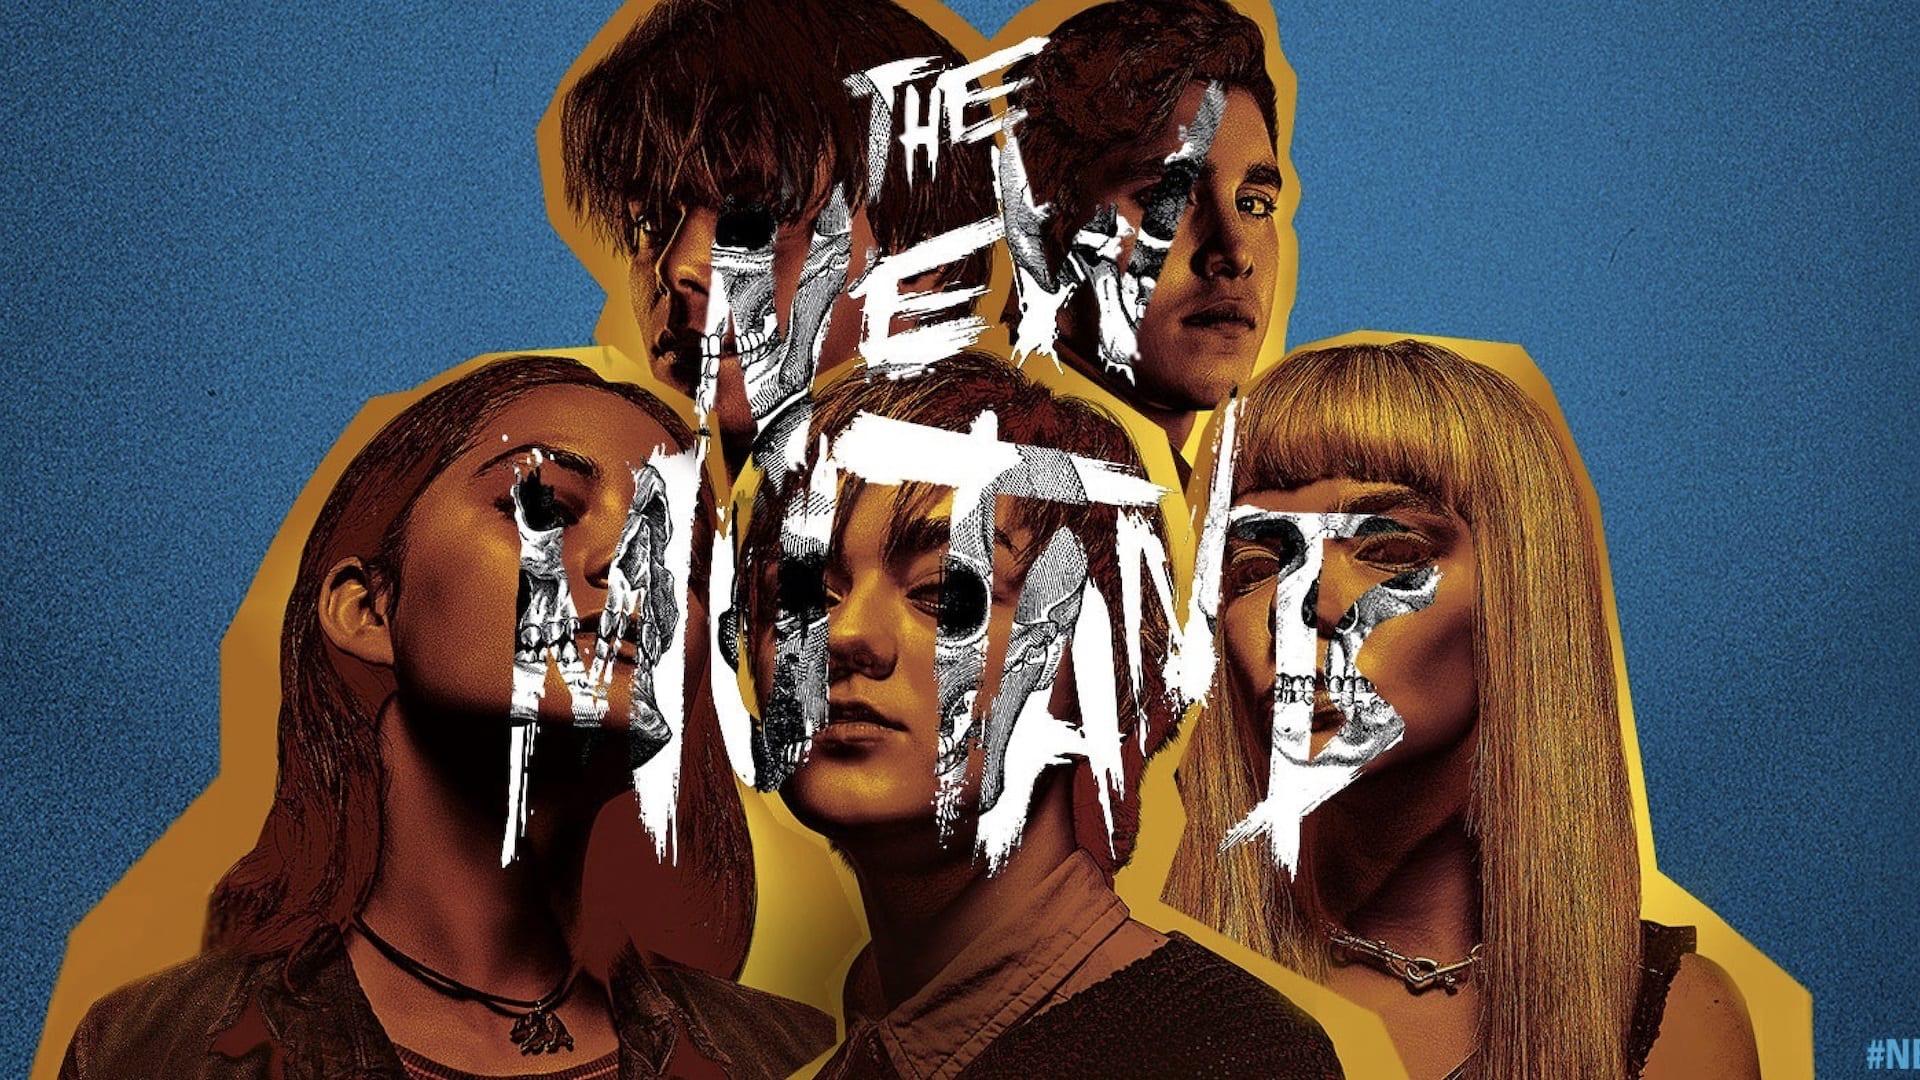 the-new-mutants-wallpaper-1599659399.jpg